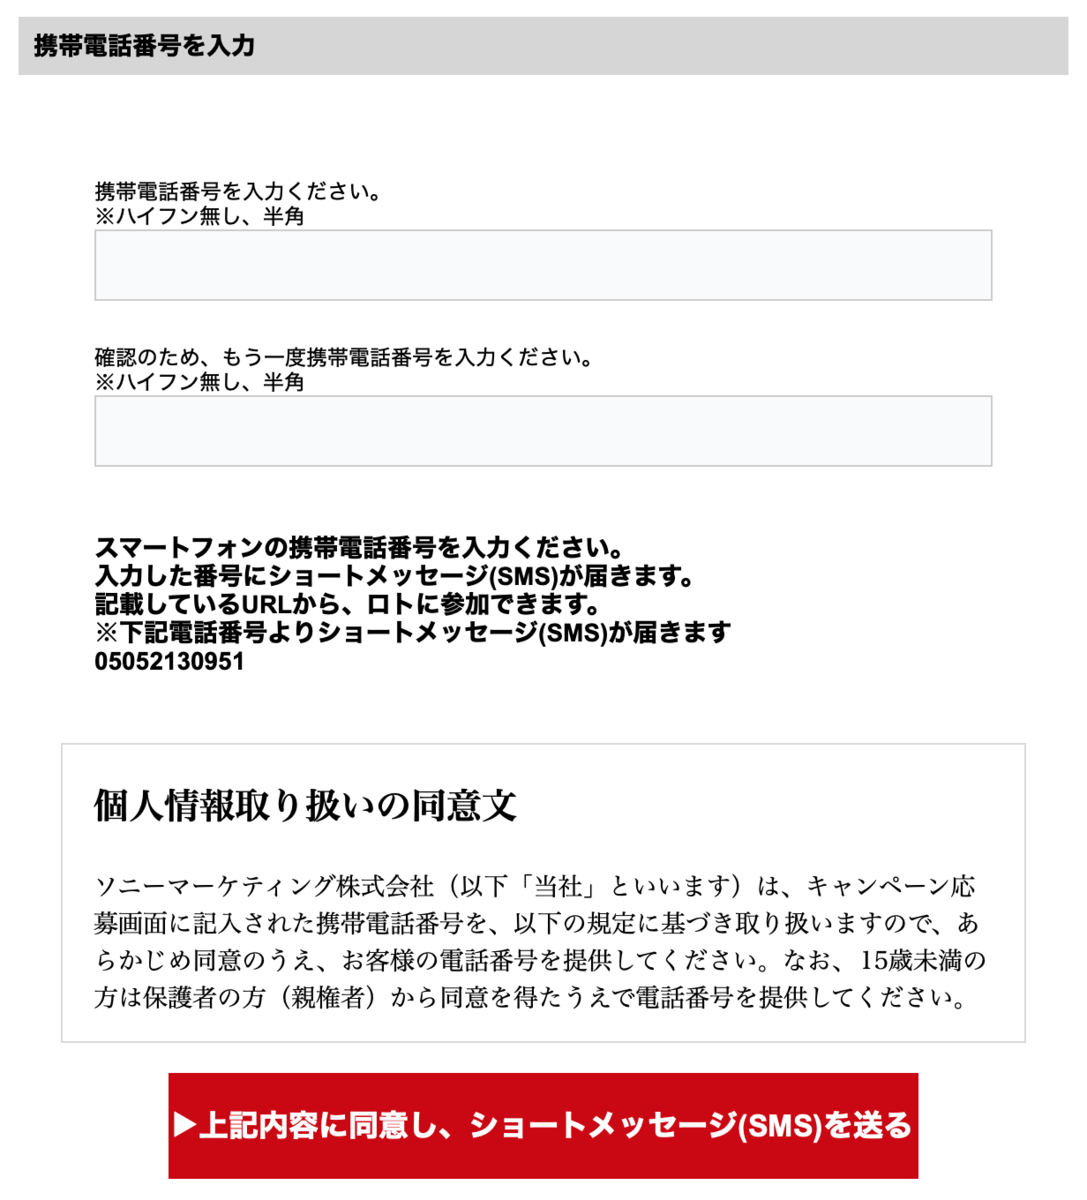 f:id:kojiki-arukikata:20200425035743p:plain